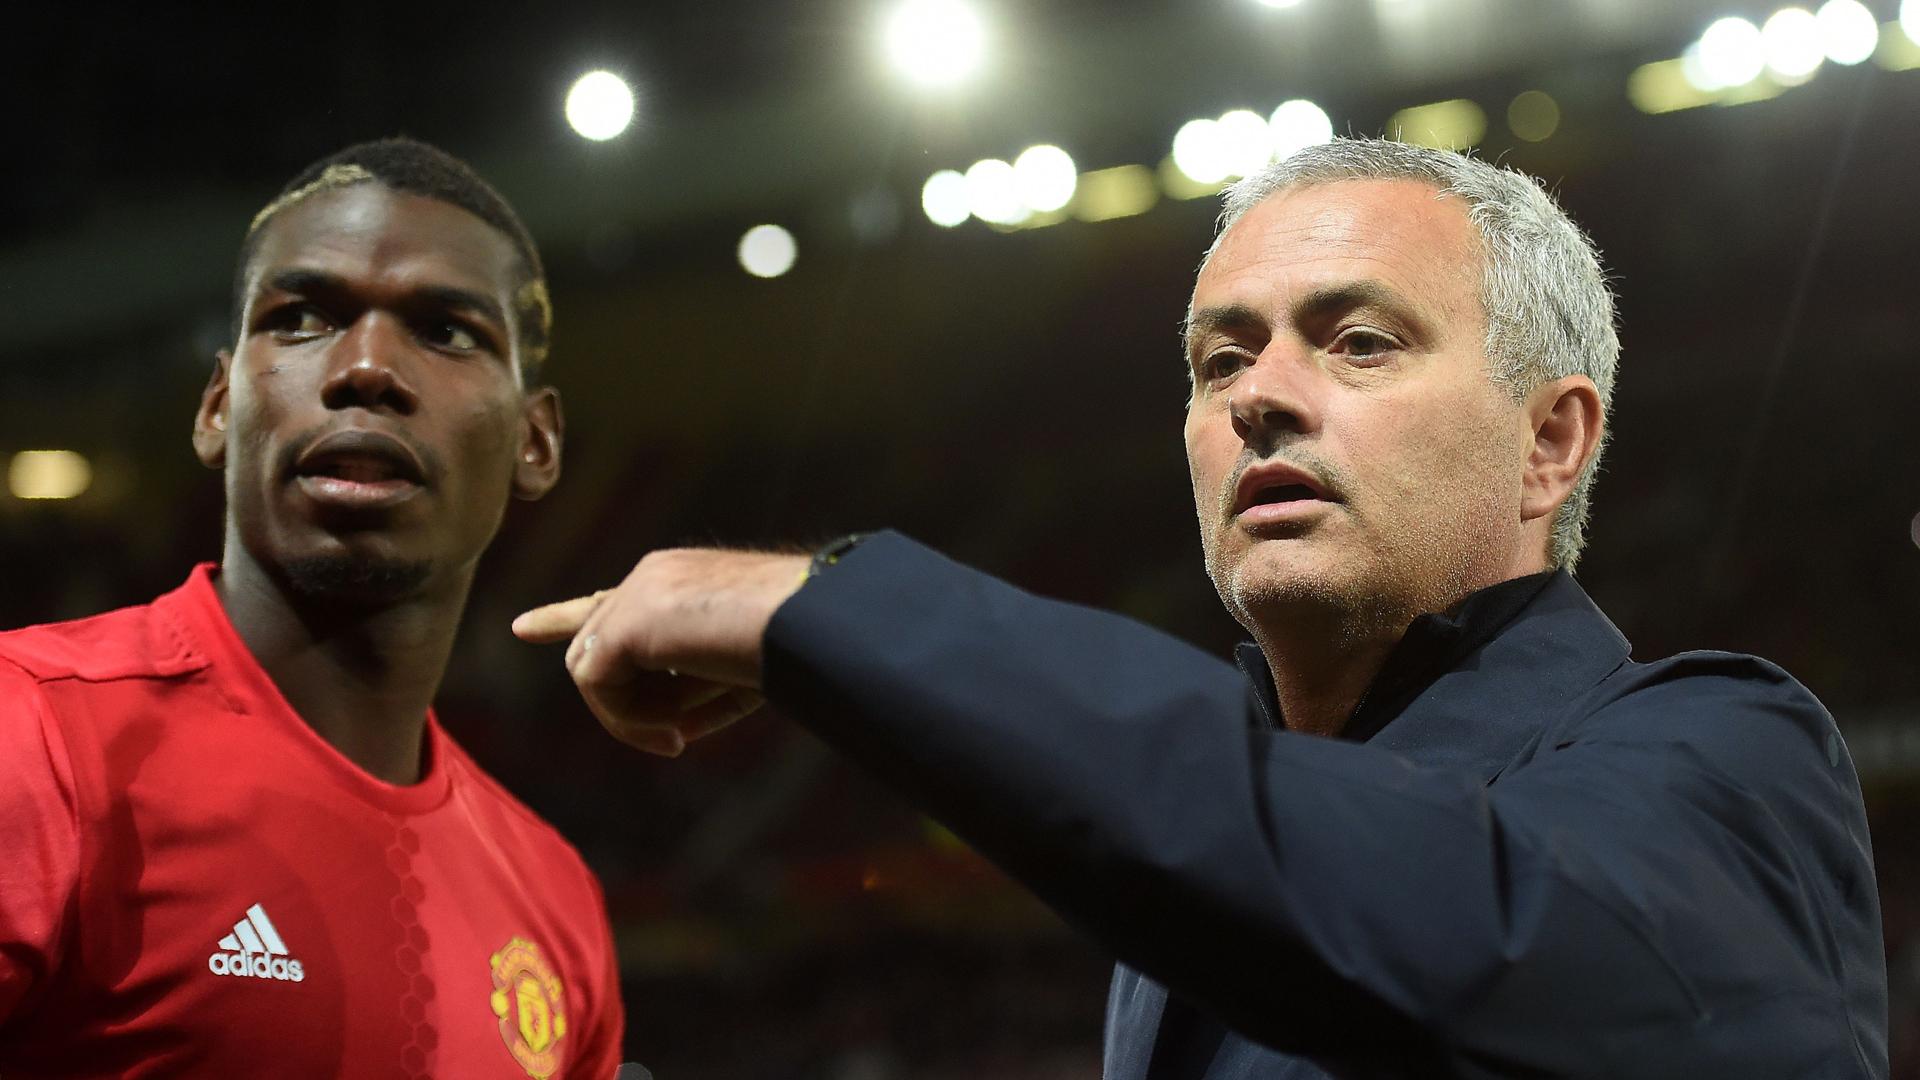 Odegbami: Between Man United, Mourinho and Pogba!